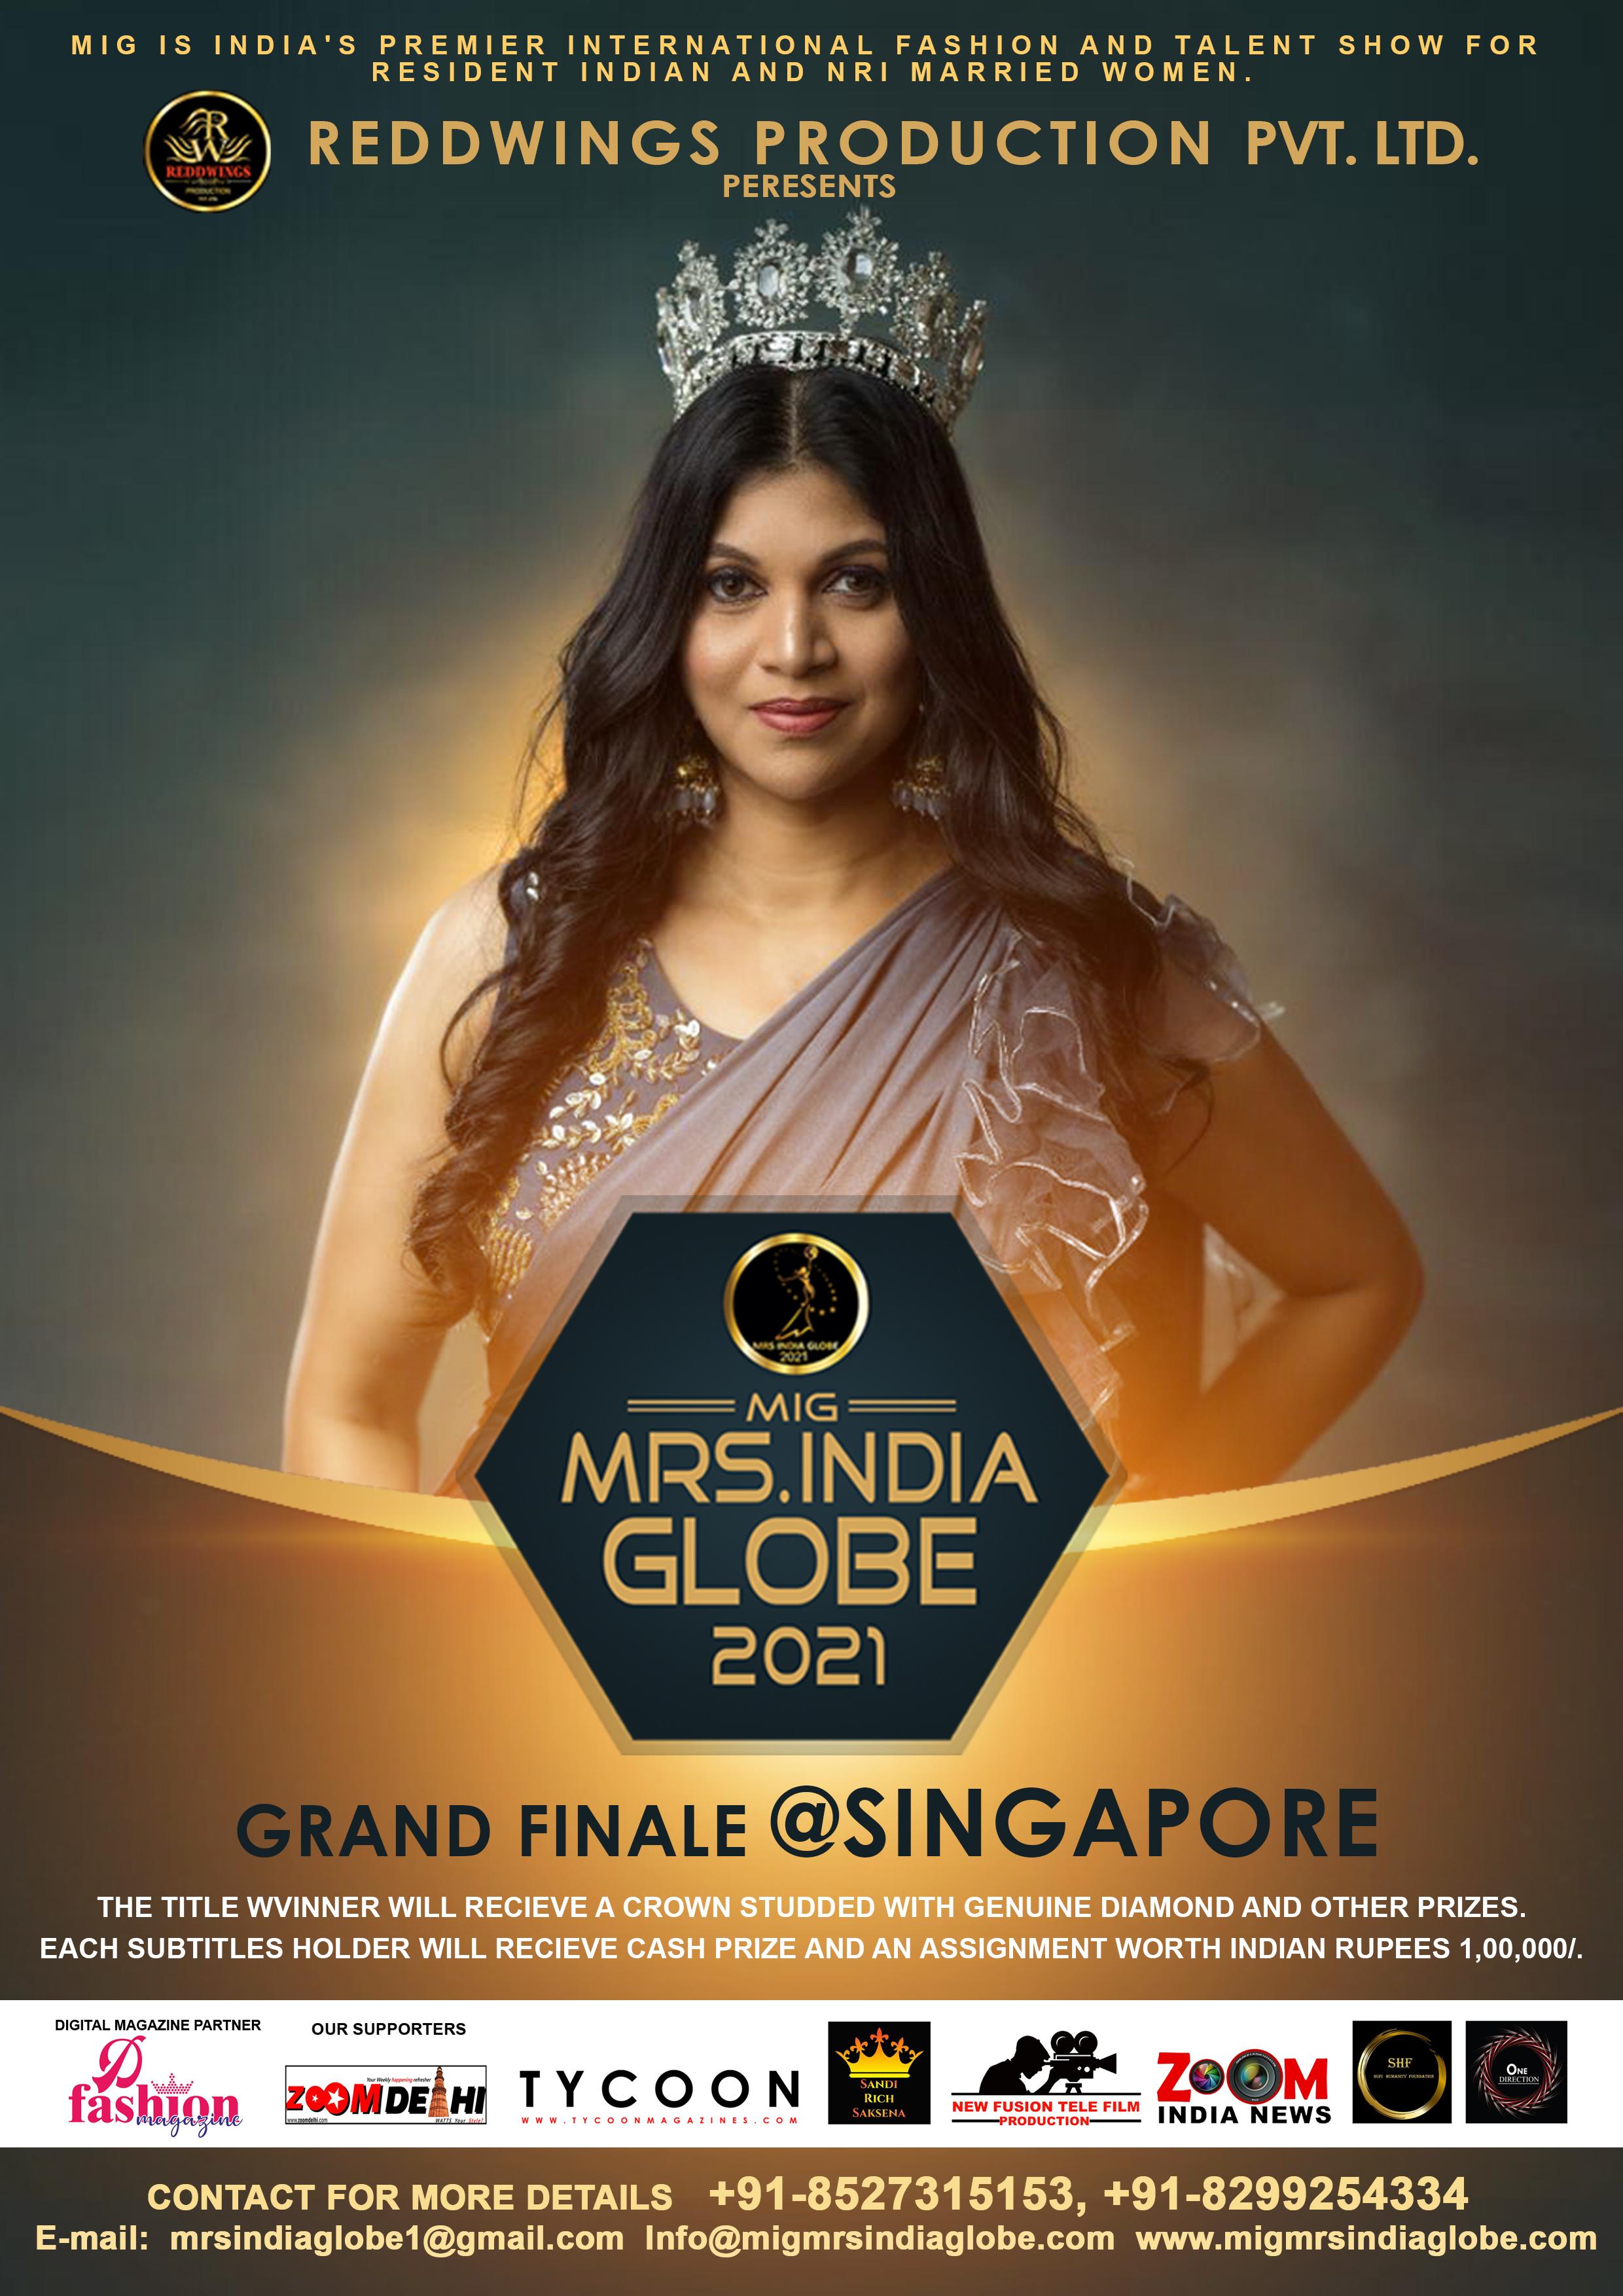 Mrs. India Globe 2021